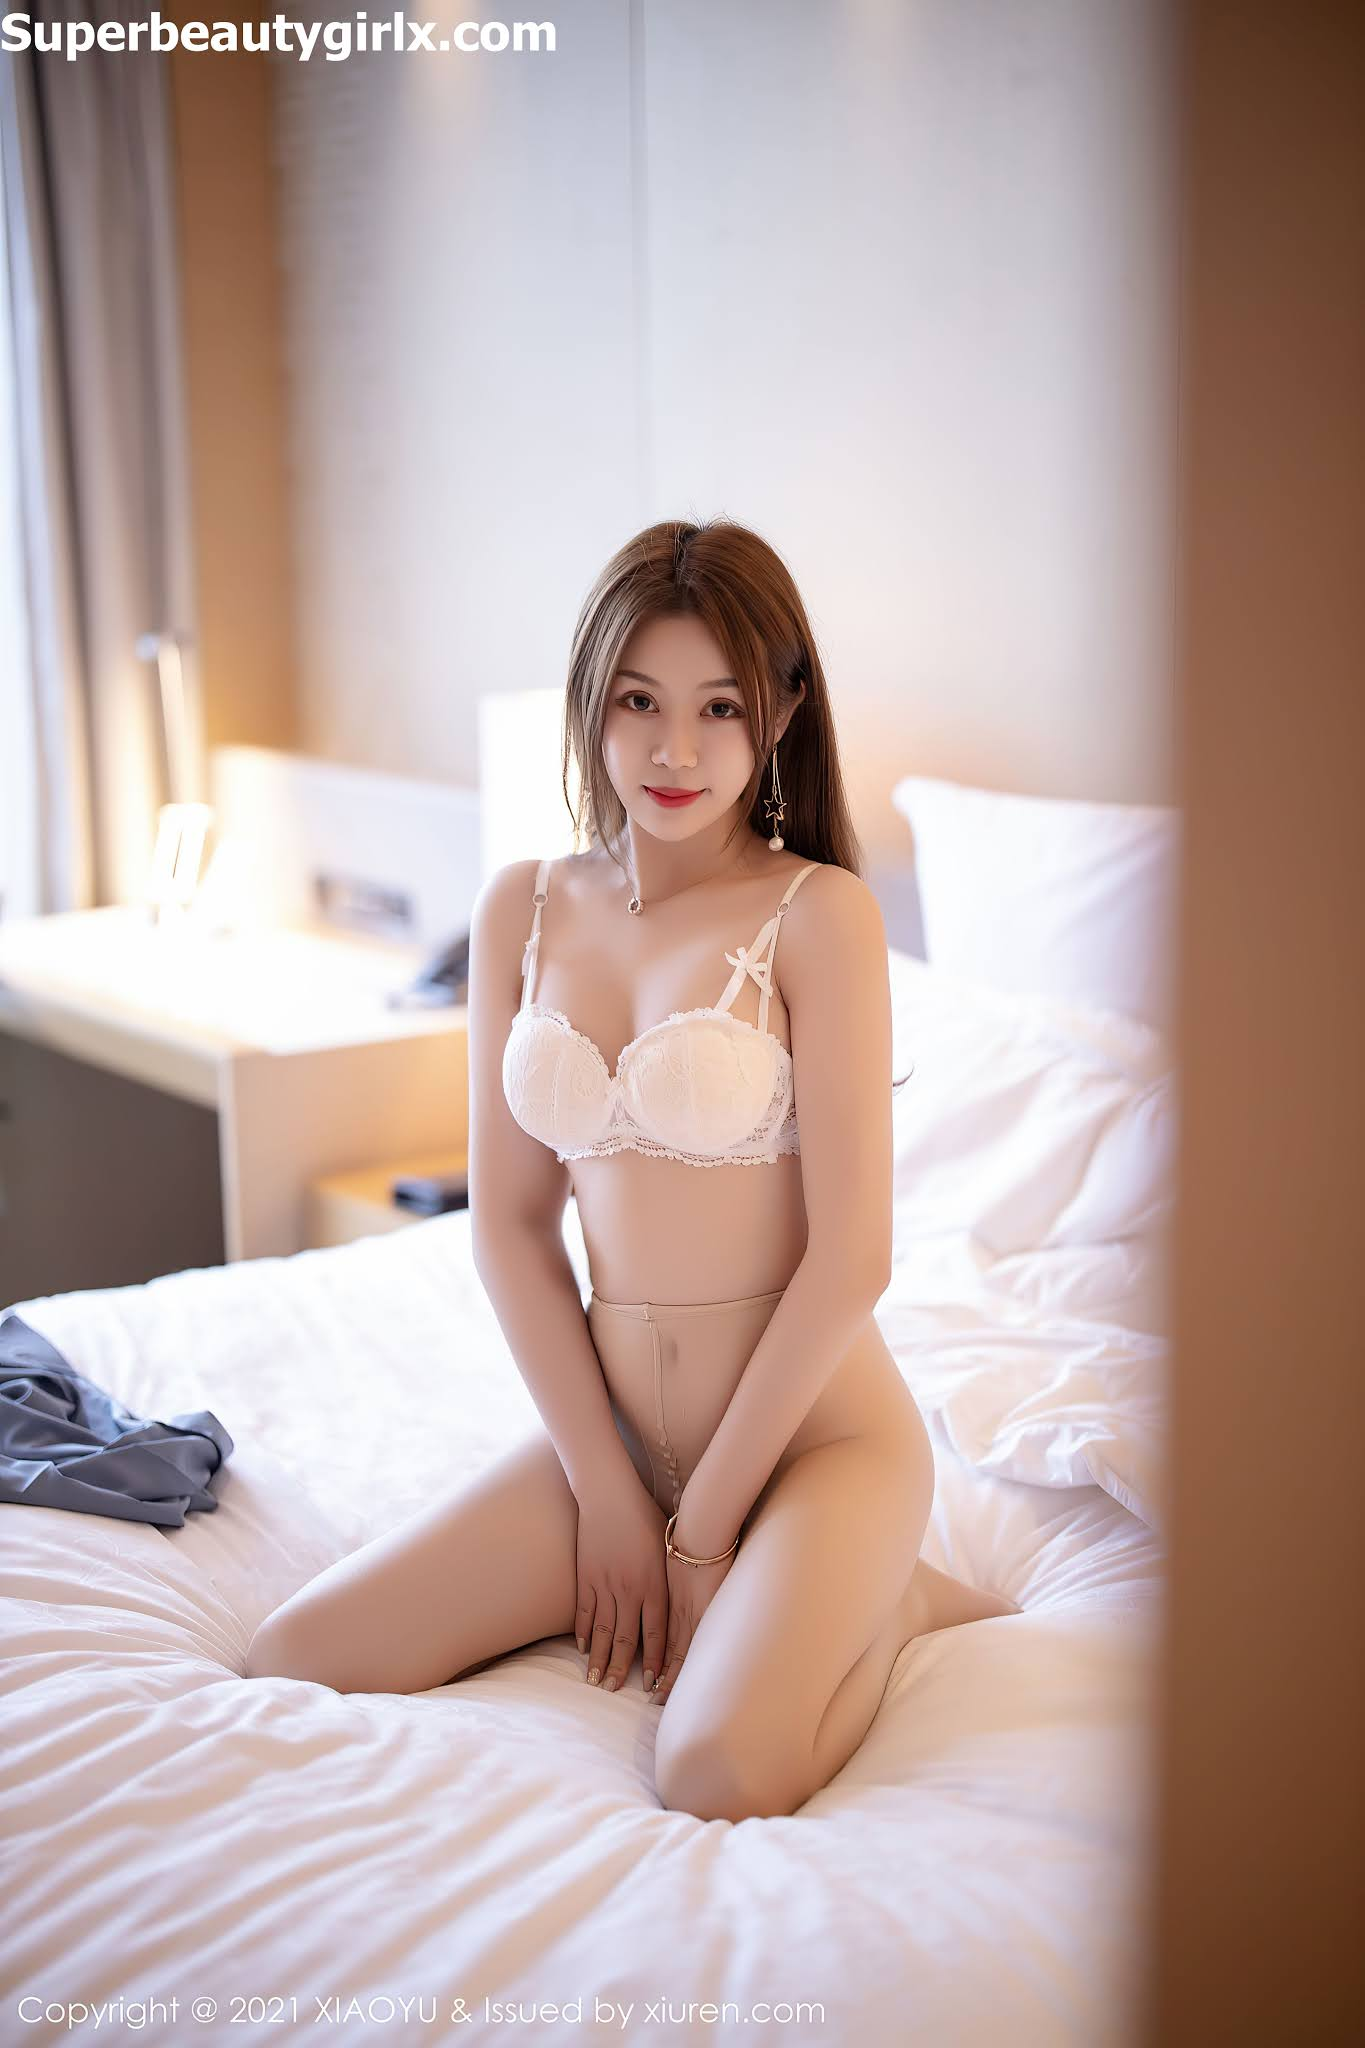 XiaoYu-Vol.480-Superbeautygirlx.com